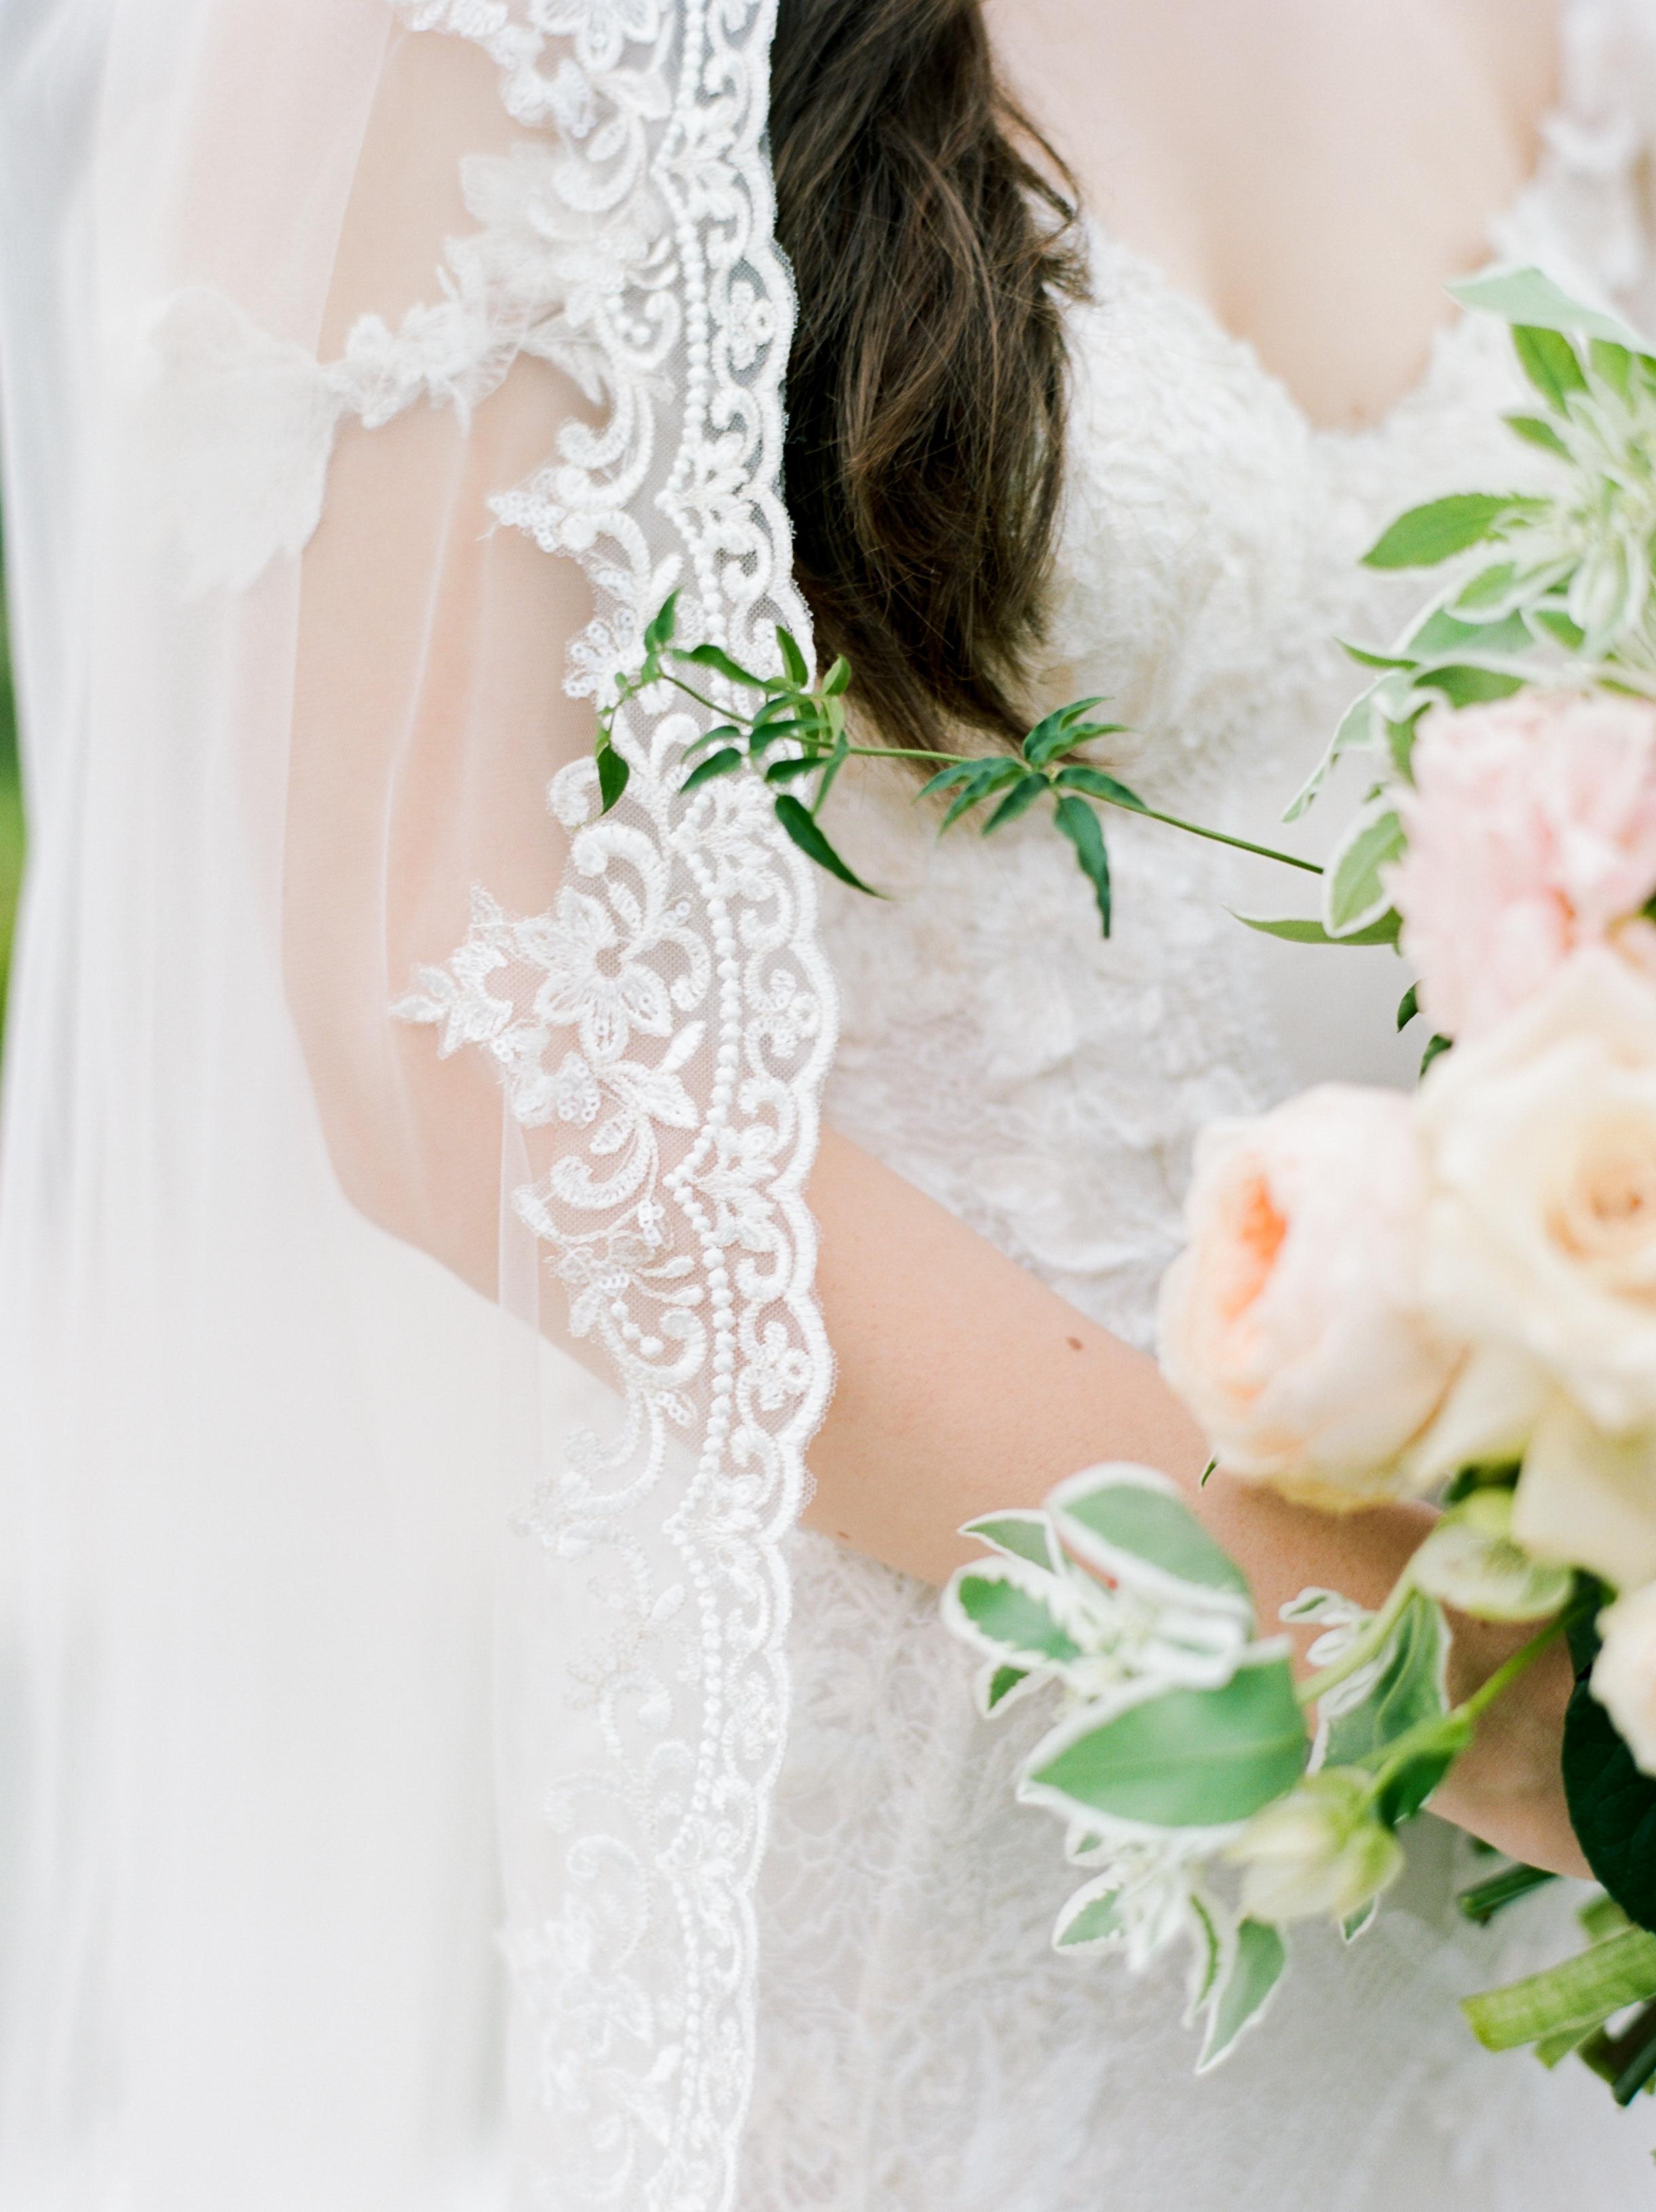 Fine-Art-Film-Houston-Wedding-Photographer-Best-Top-Luxury-Texas-Austin-Dallas-Destination-Dana-Fernandez-Photography-Portrait-Bridals-McGovern-Centennial-Gardens-6.jpg